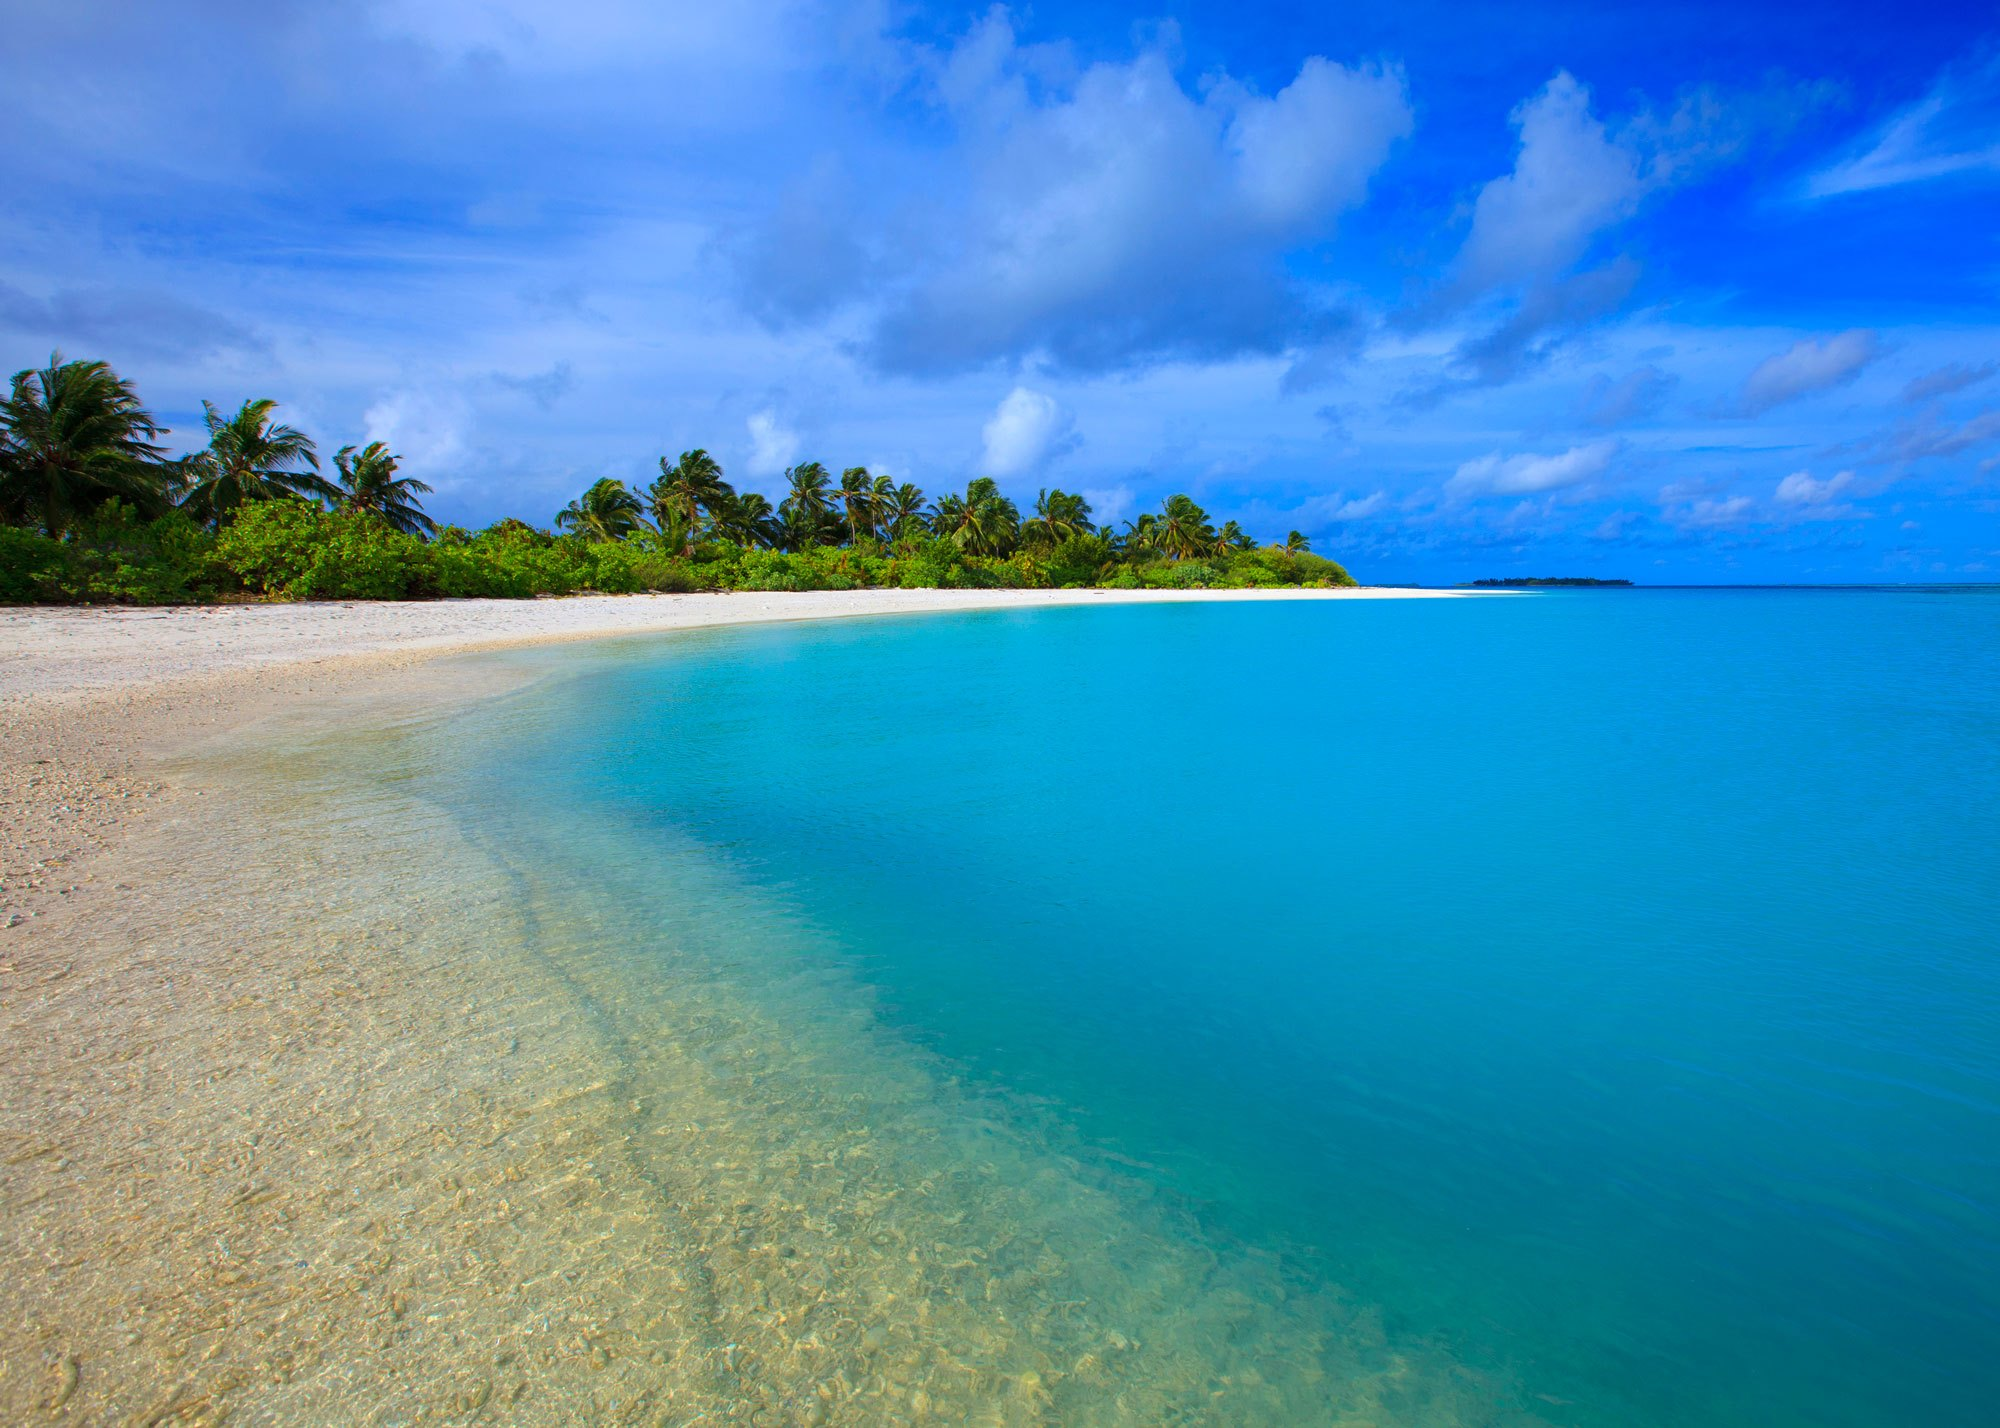 Tropical Paradise Wallpaper High Resolution: Paradise Beach Wallpaper